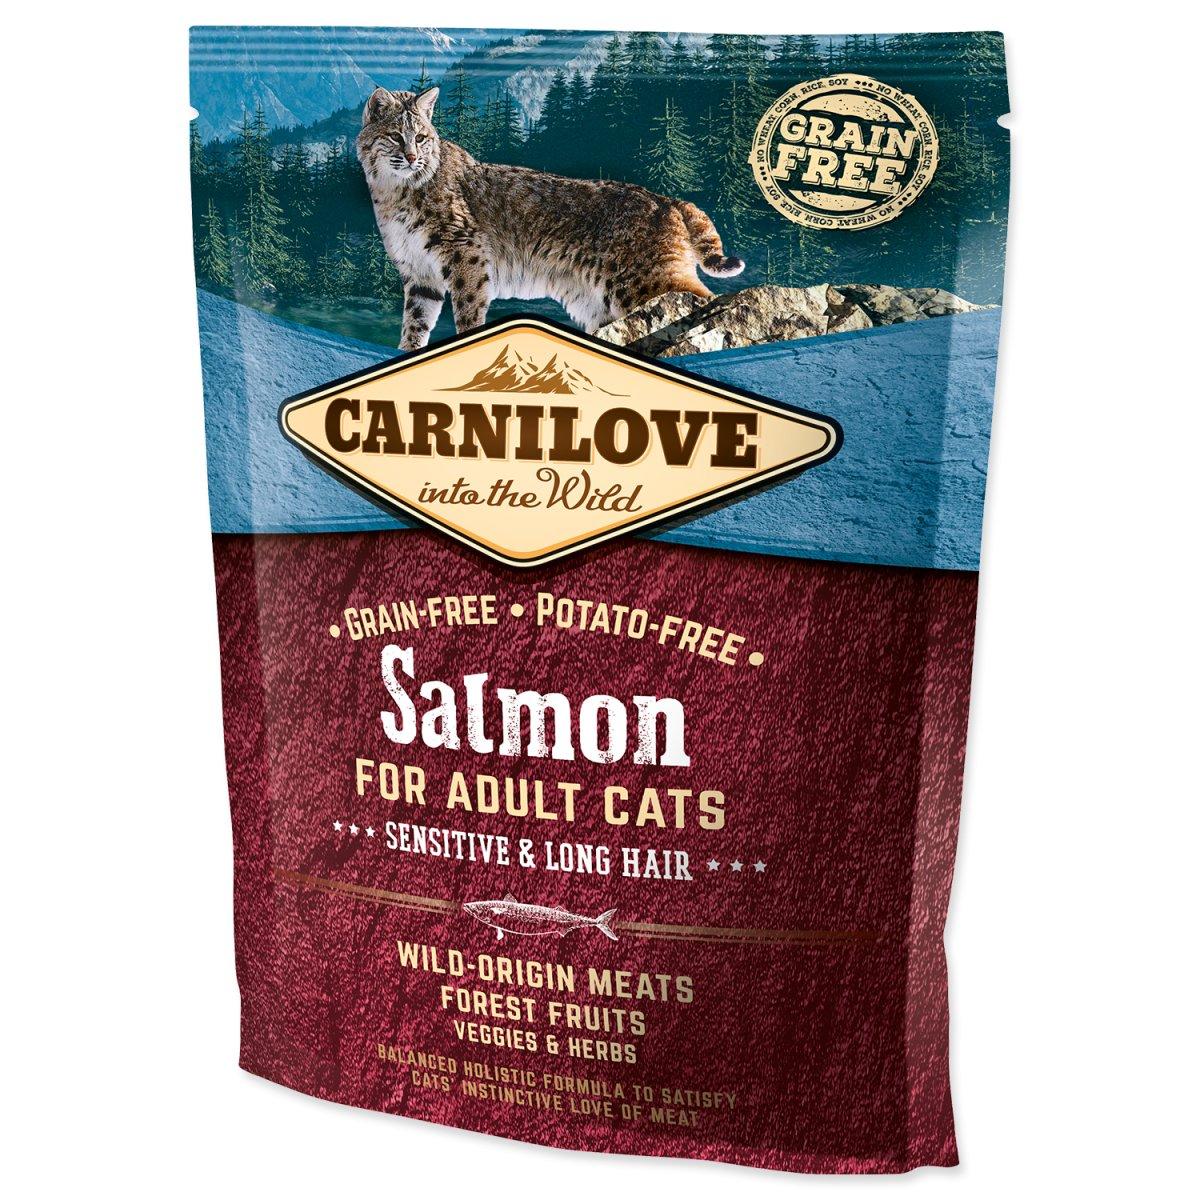 CARNILOVE Salmon Adult Cats Sensitive and Long Hair (400g)